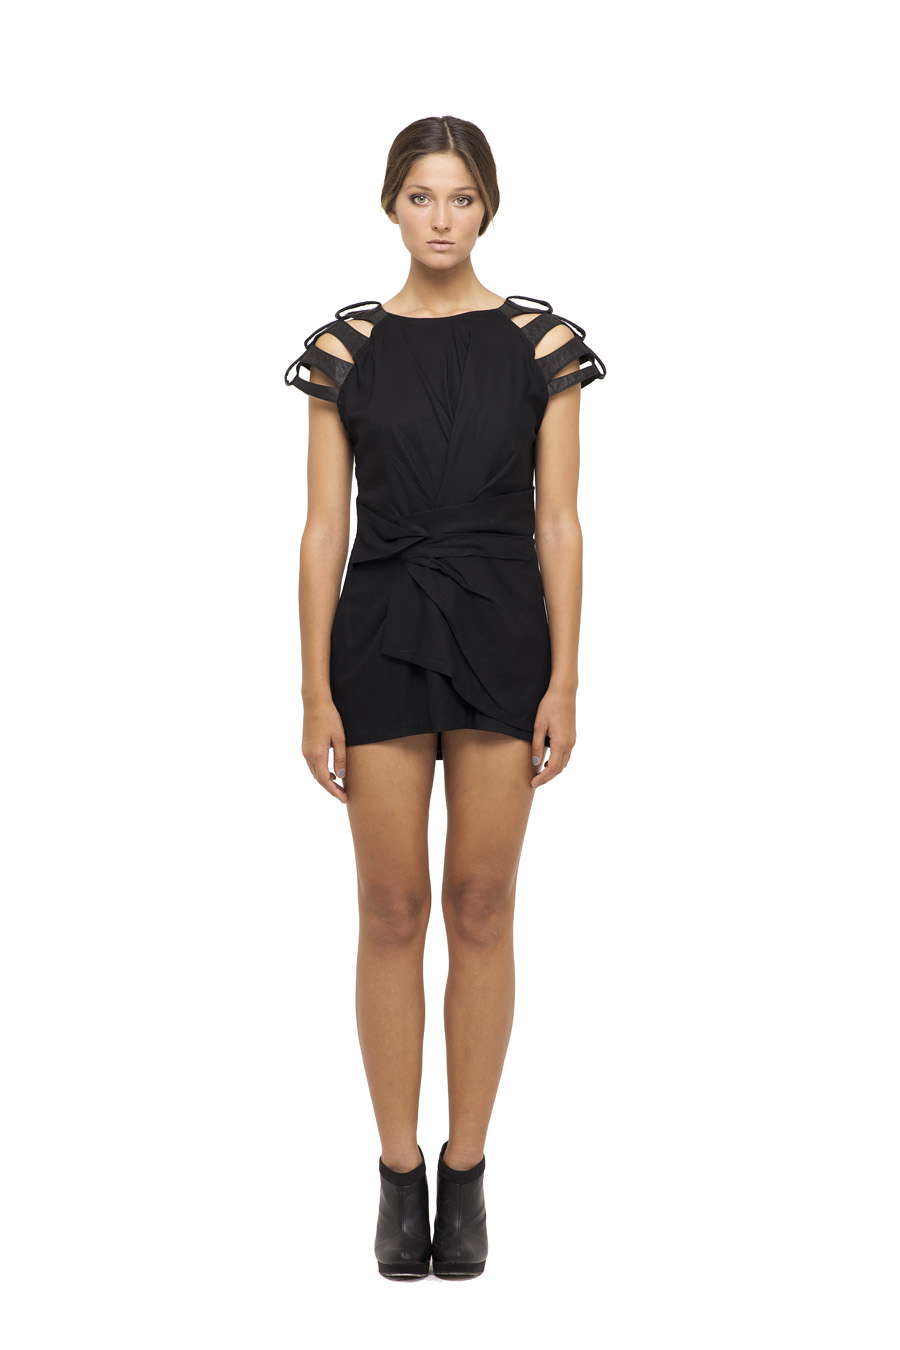 Should Dress